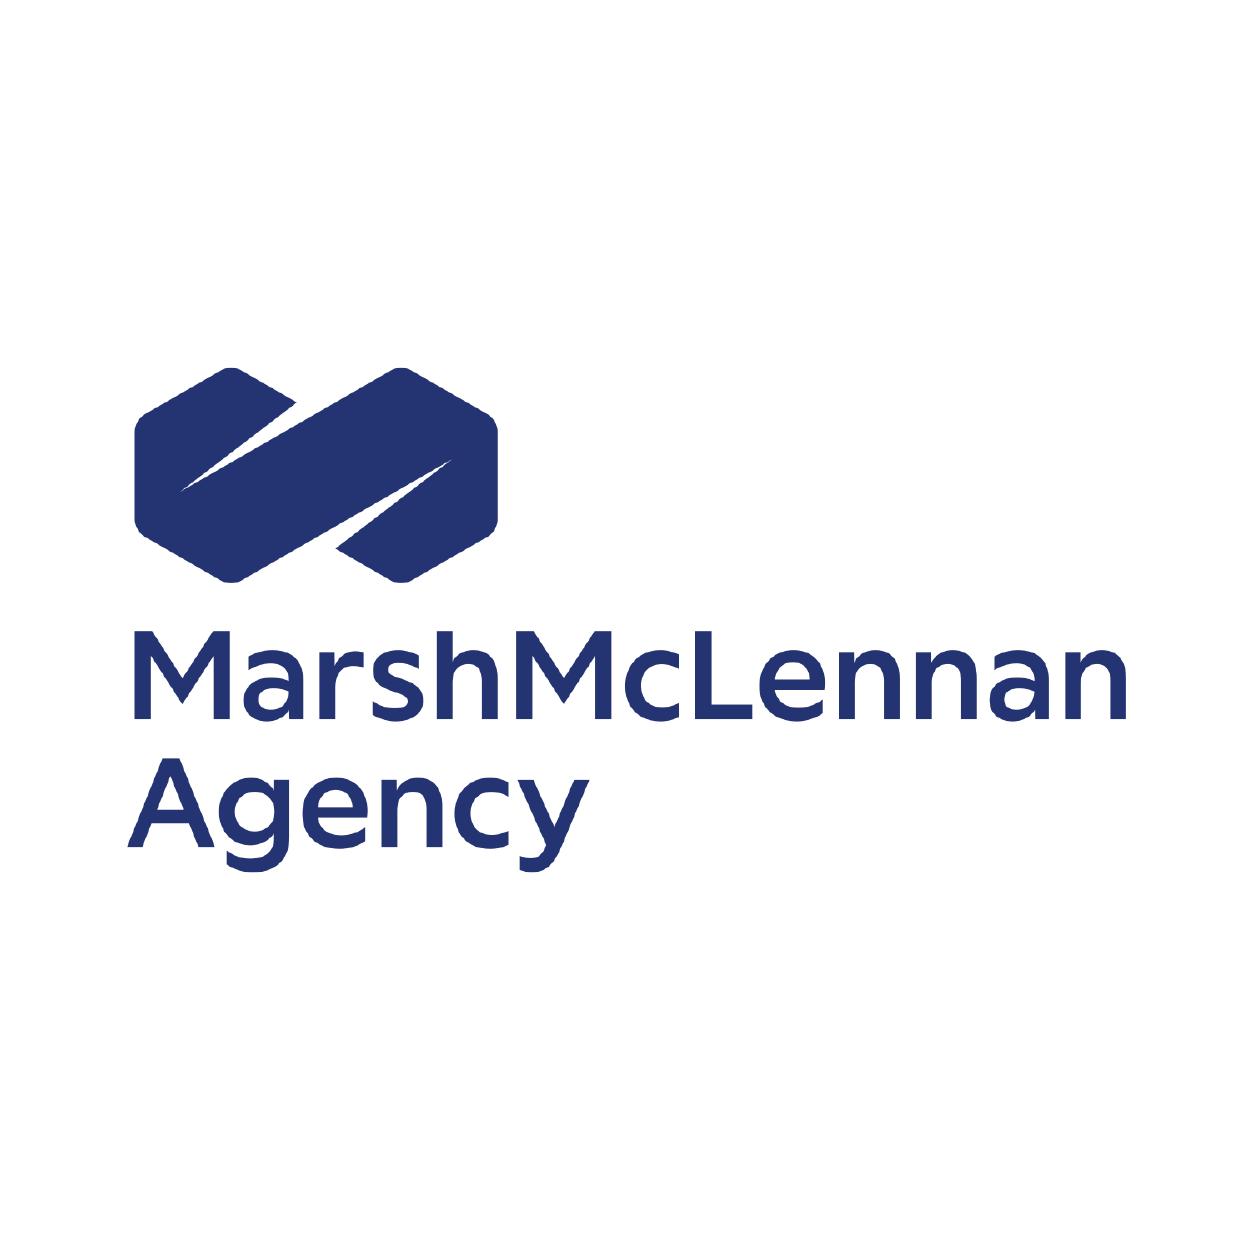 Marsh McLennan Agency logo